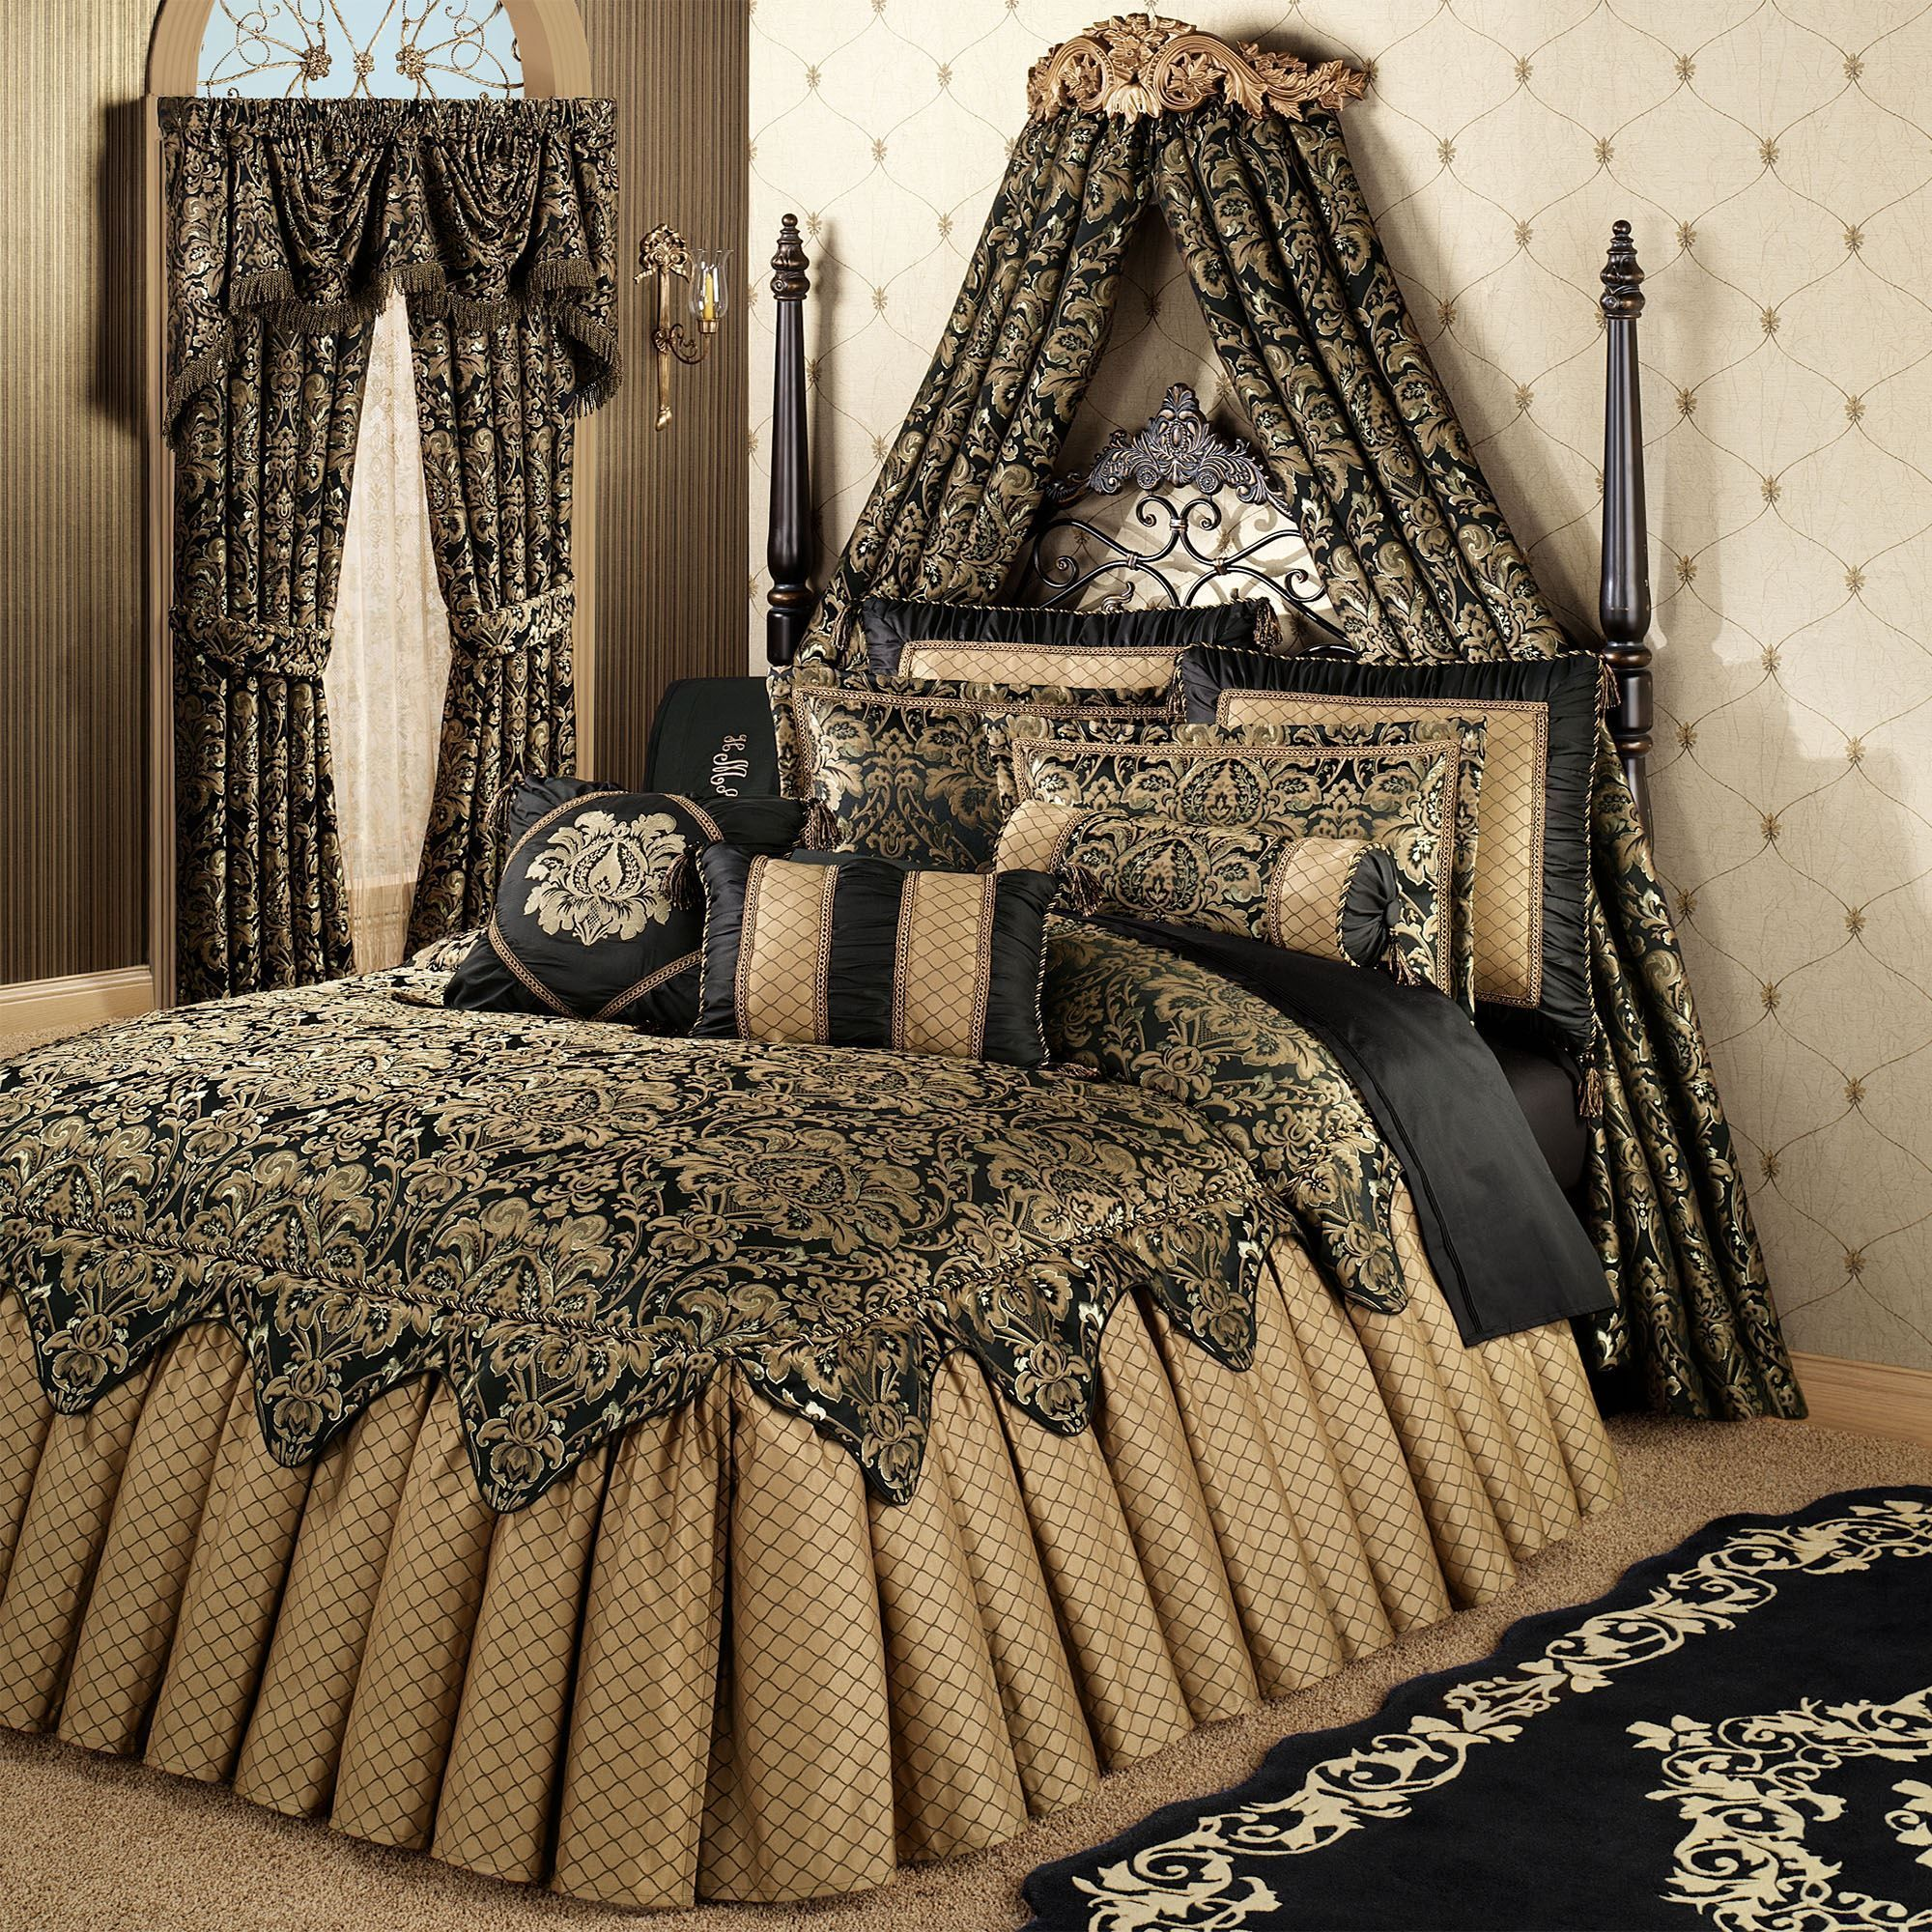 Imperial Grande Bedspread Black Goldbedding Bed Linens Luxury